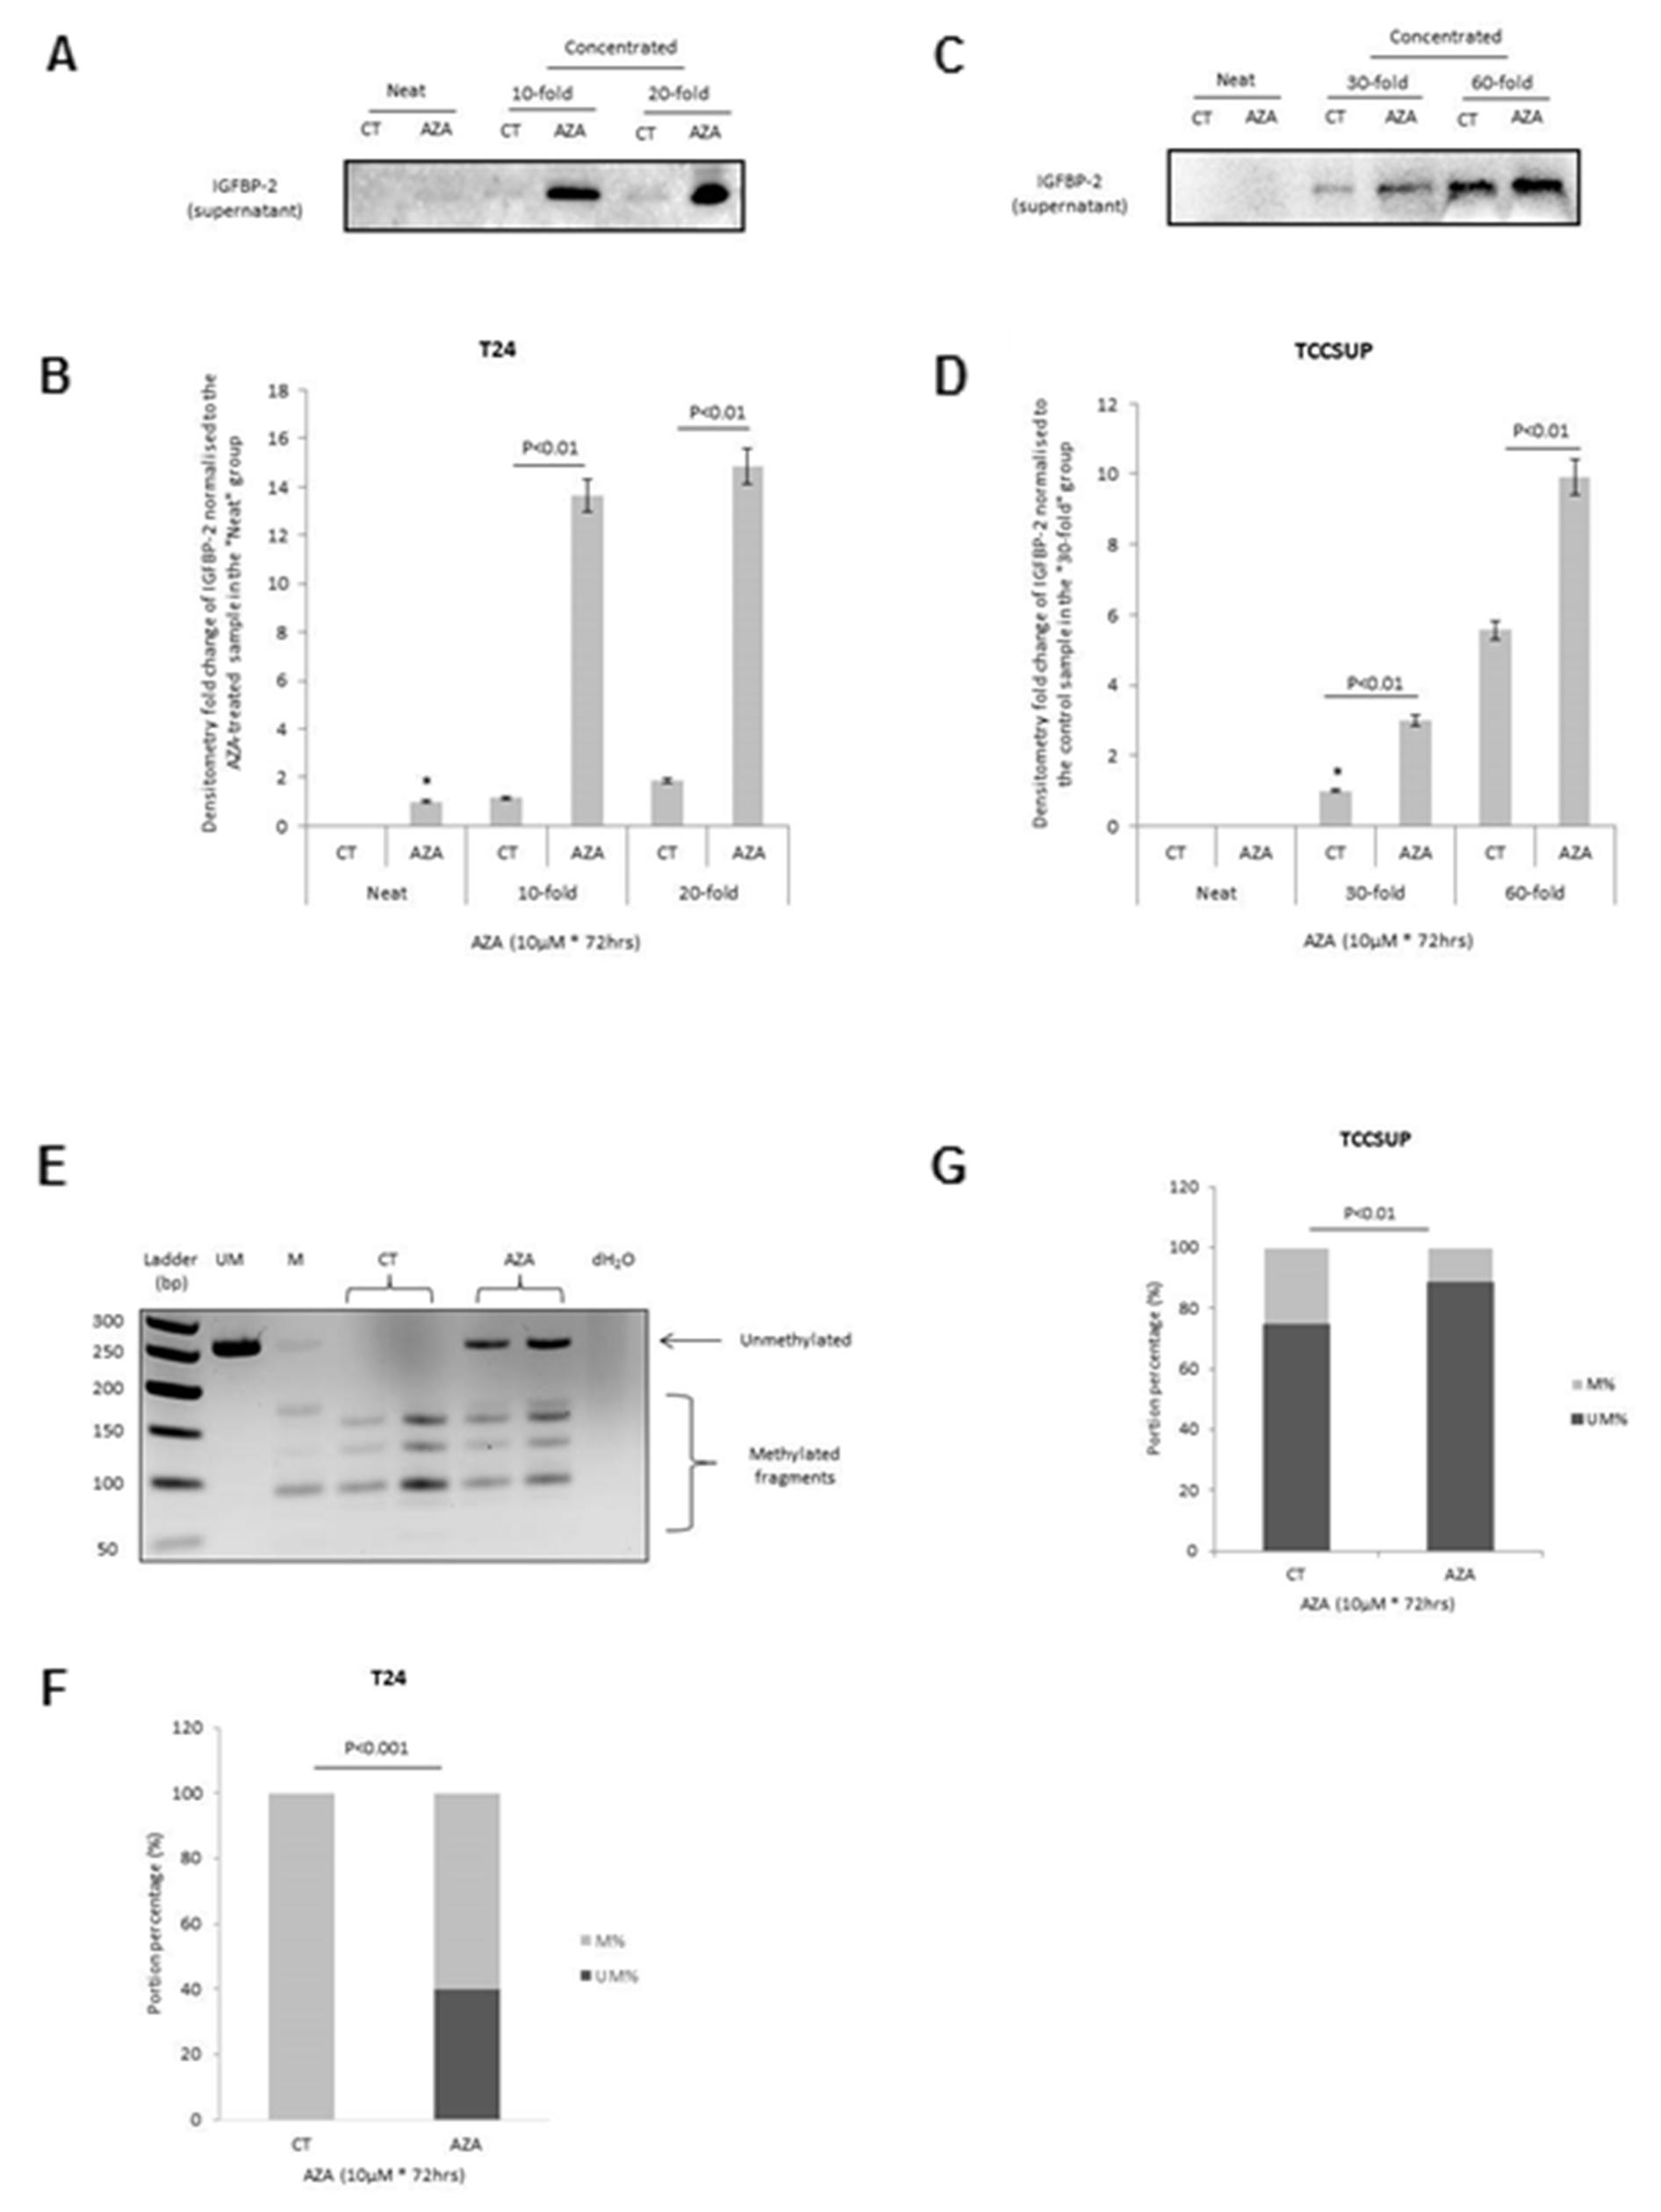 Effect of 5-AZA on the abundance and methylation status of the IGFBP-2 gene promoter.